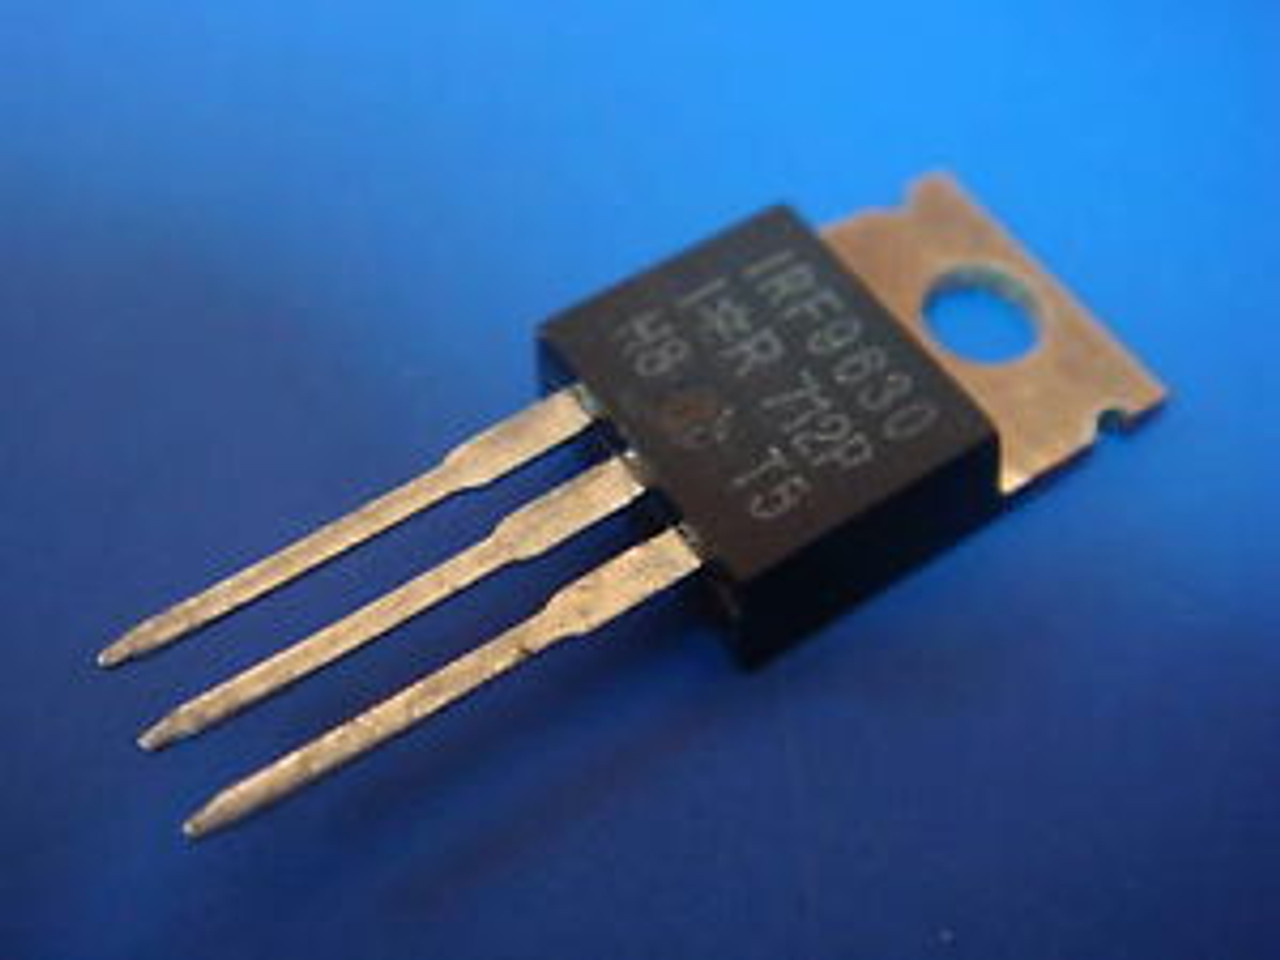 IRF9630 Lot de 3 Transistor MOS IRF 9630